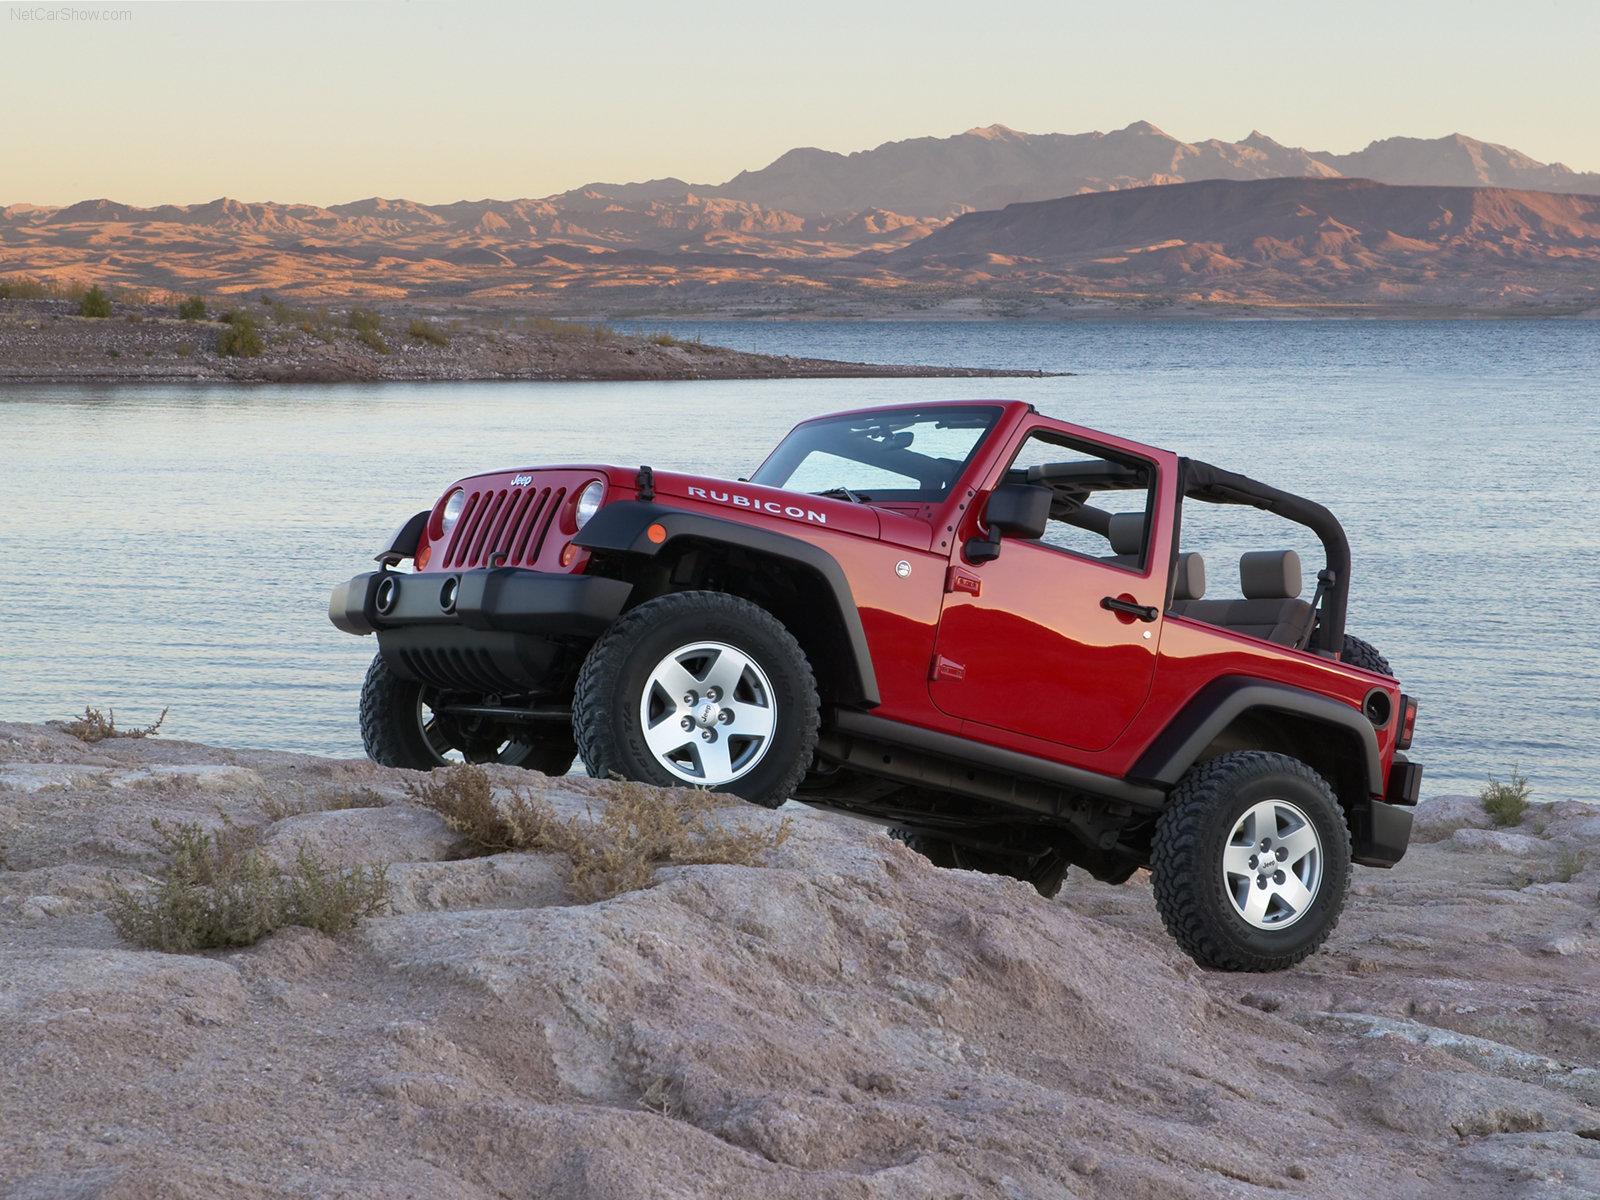 2007 Jeep Wrangler Unlimited Wiki